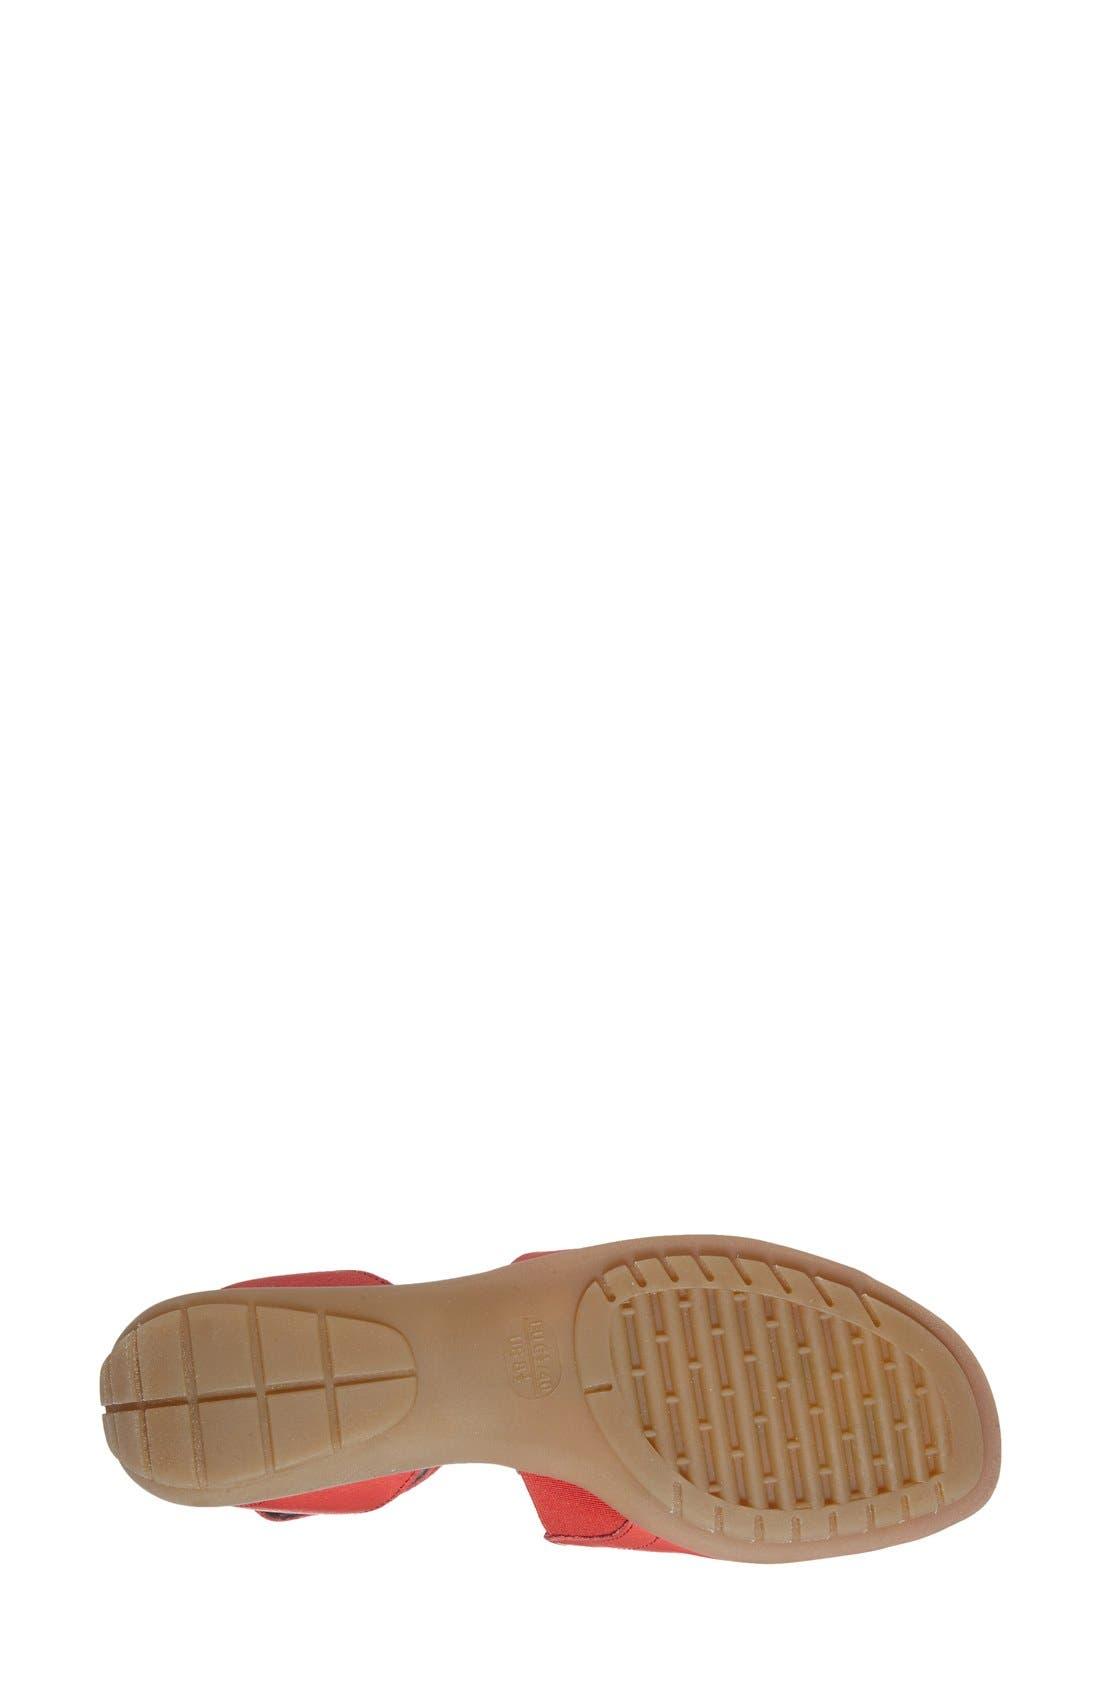 'Beglad' Leather Ankle Strap Sandal,                             Alternate thumbnail 64, color,